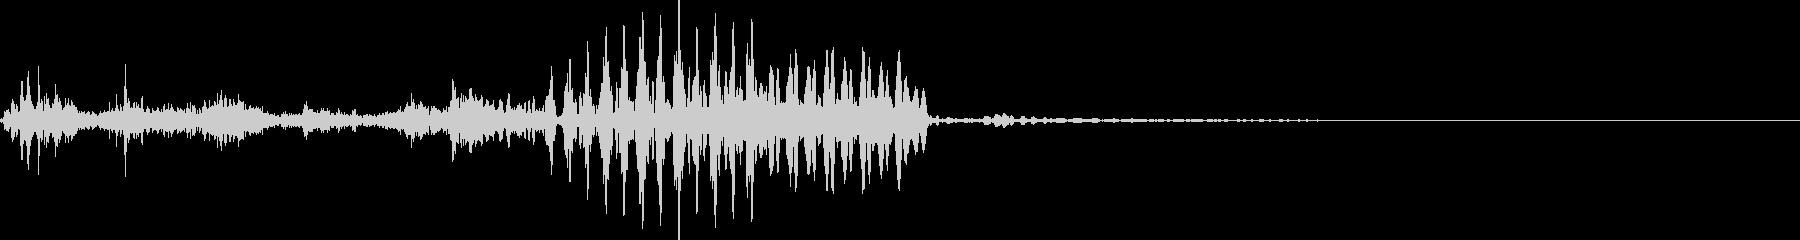 SF 電気ノイズ系 サウンドロゴ の未再生の波形